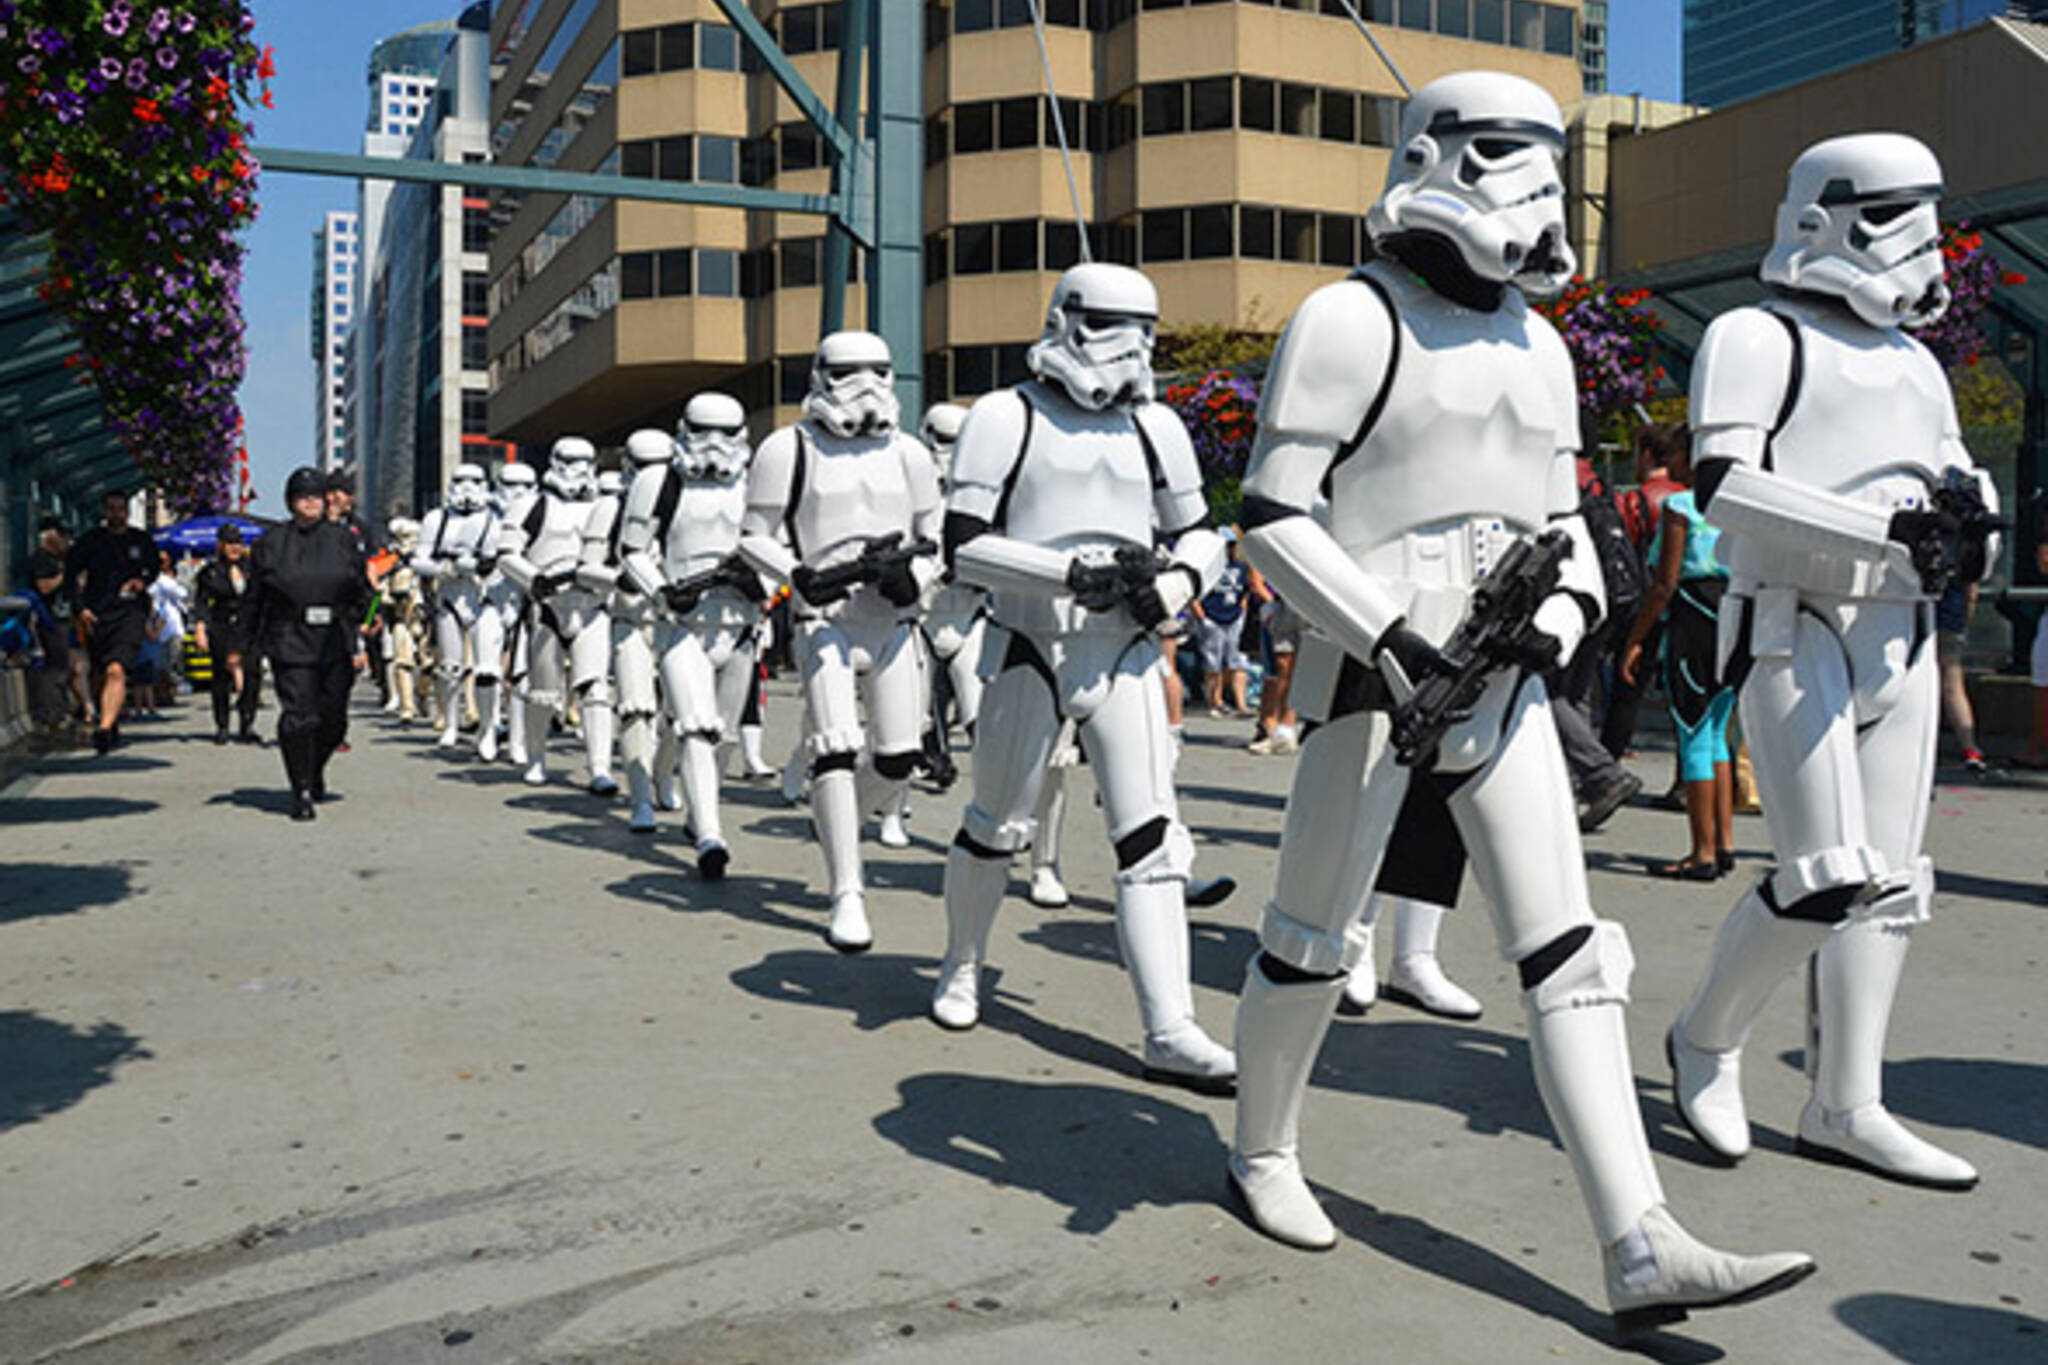 Storm troopers toronto